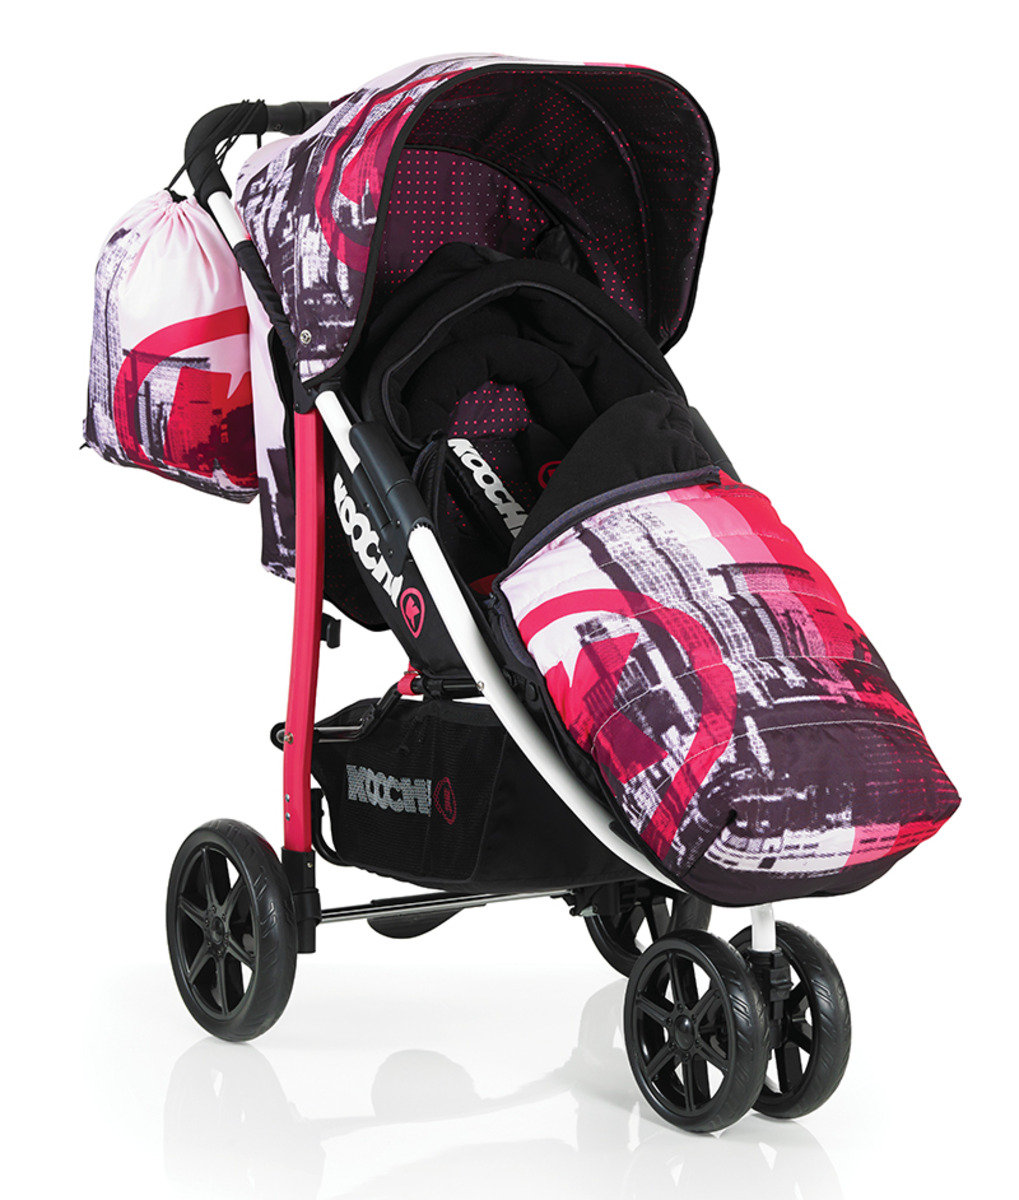 英國 Koochi Pushmatic 嬰兒三輪手推車 - Brooklyn PM